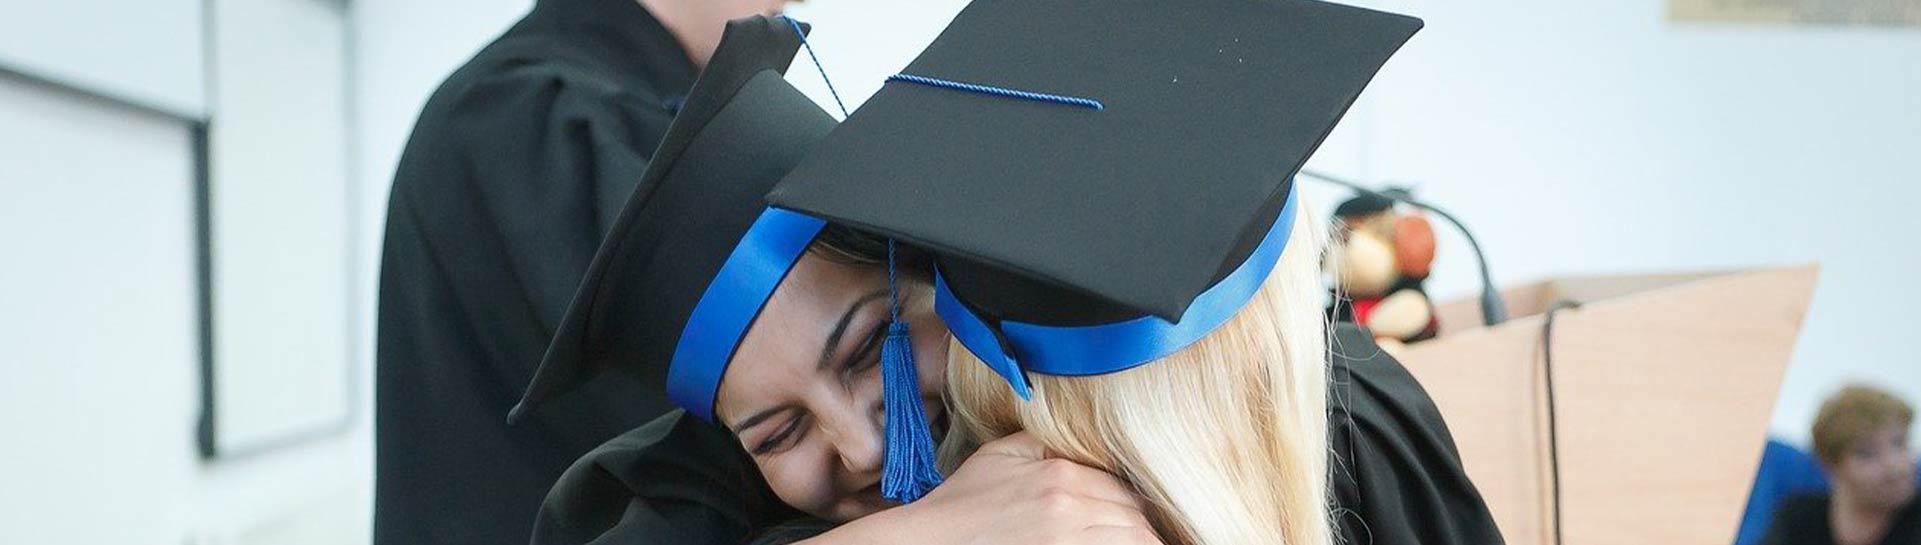 College graduates hugging on graduation day